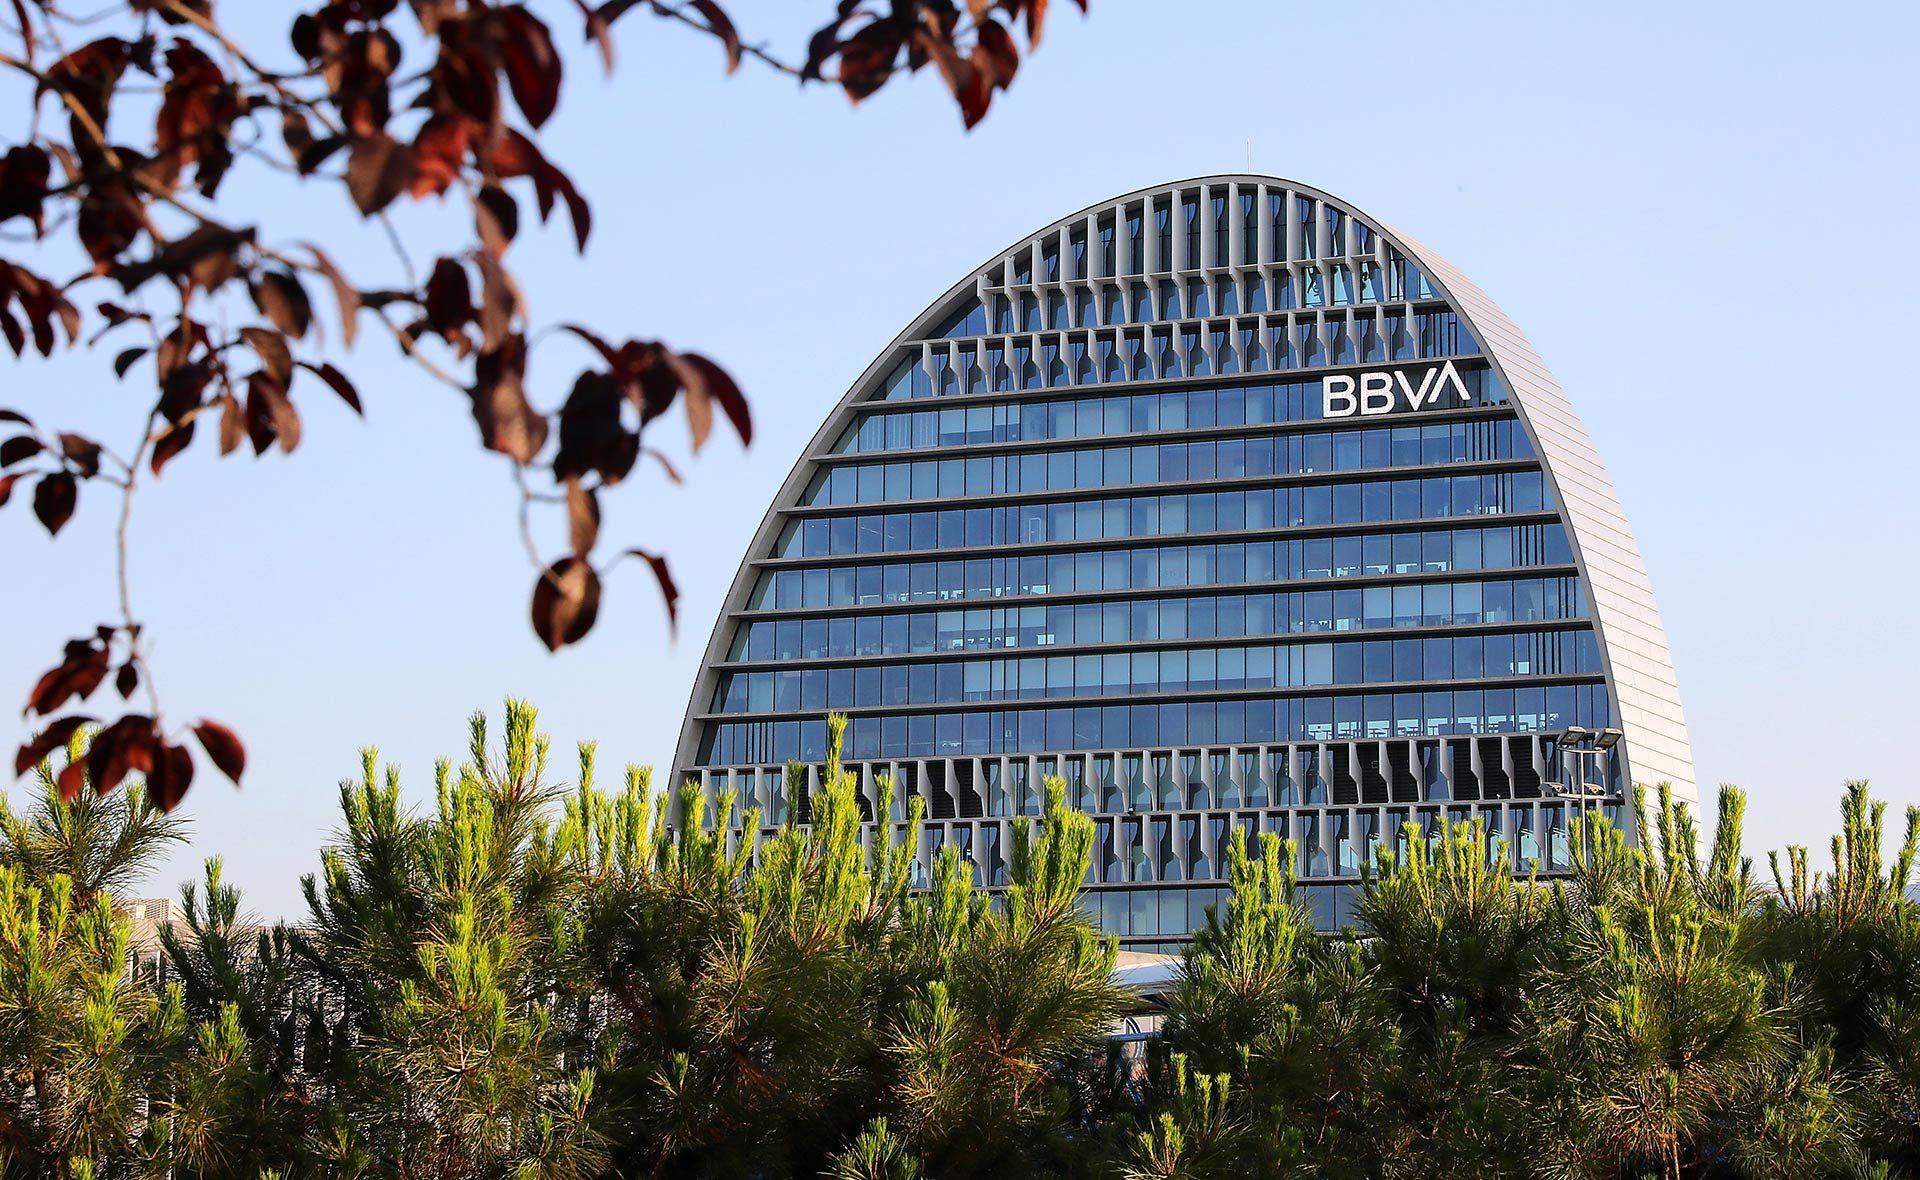 https://shareholdersandinvestors.bbva.com/wp-content/uploads/2019/10/BBVA-Resultados-v1-31102019-1920x1180.jpg